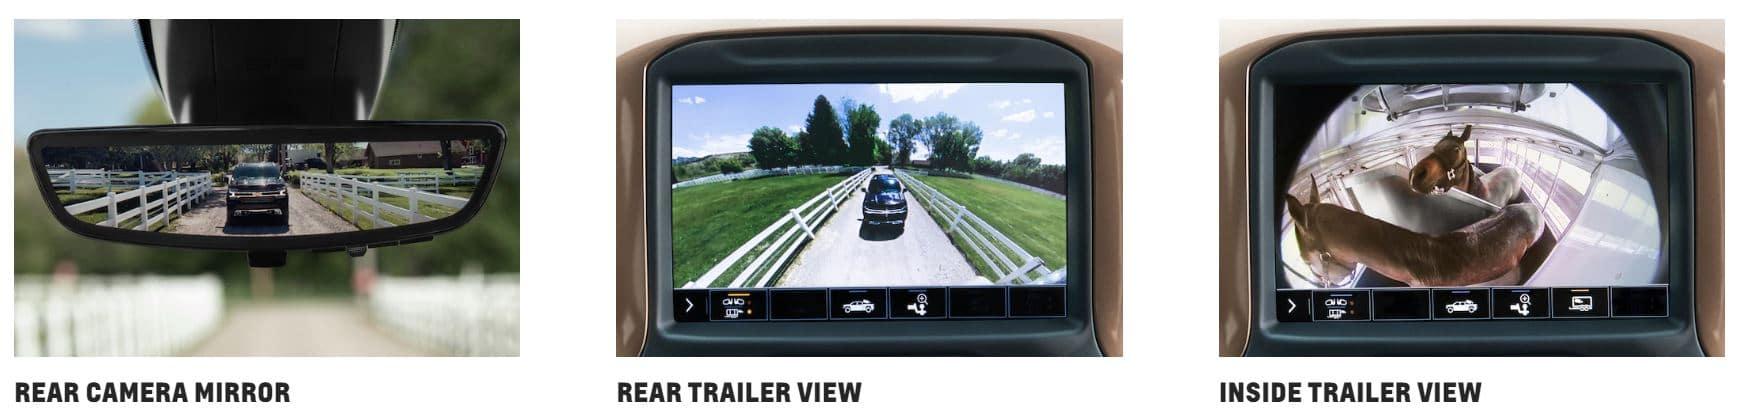 Chevrolet Silverado three camera views